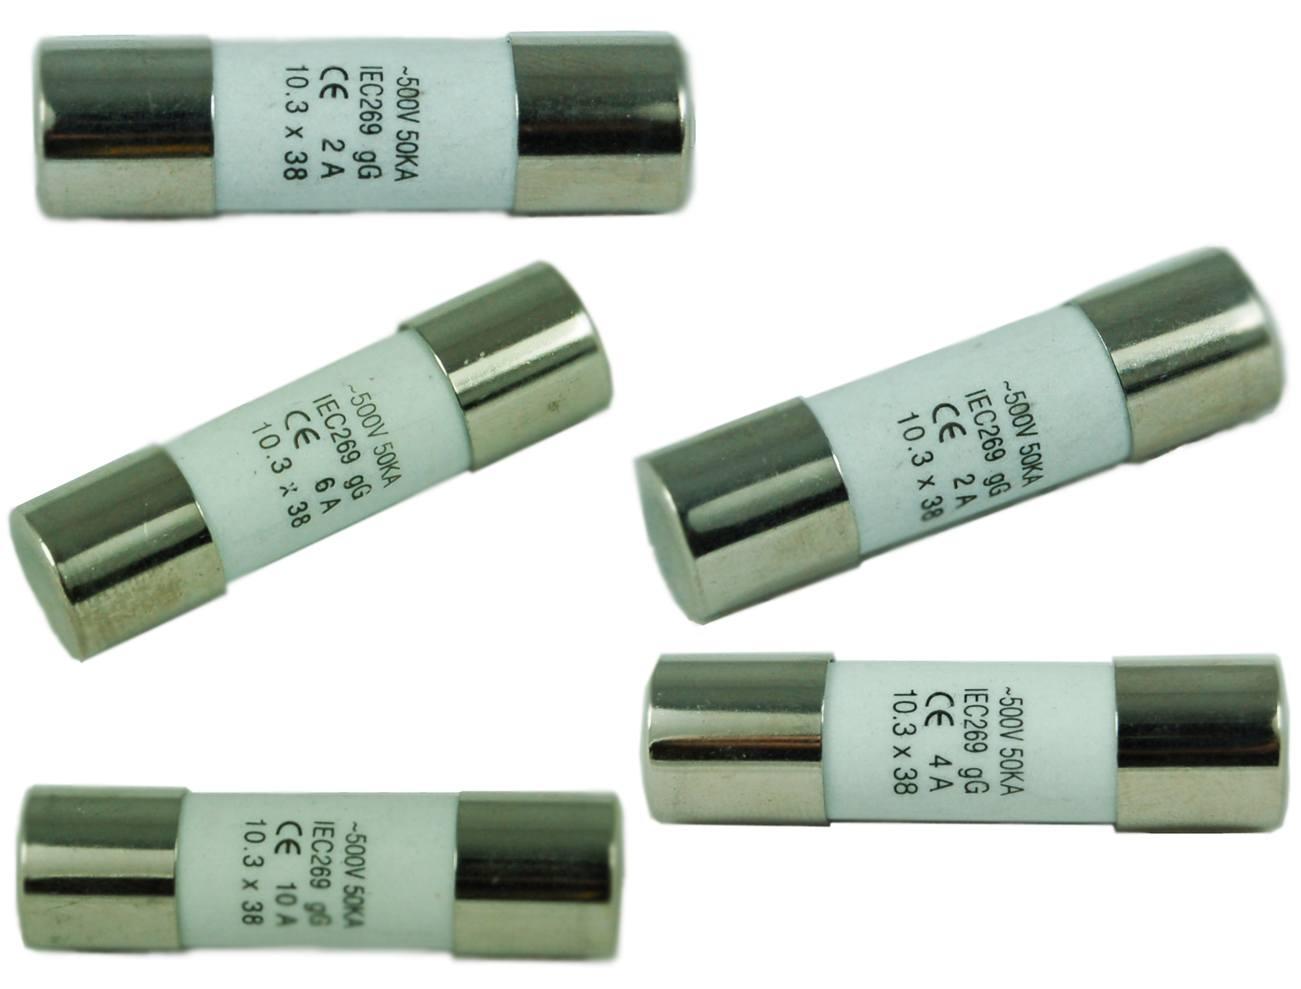 F-1038C-XX系列 500V 10x38 陶瓷管保險絲 - F-1038C-XX系列 500V 10x38 陶瓷管保險絲